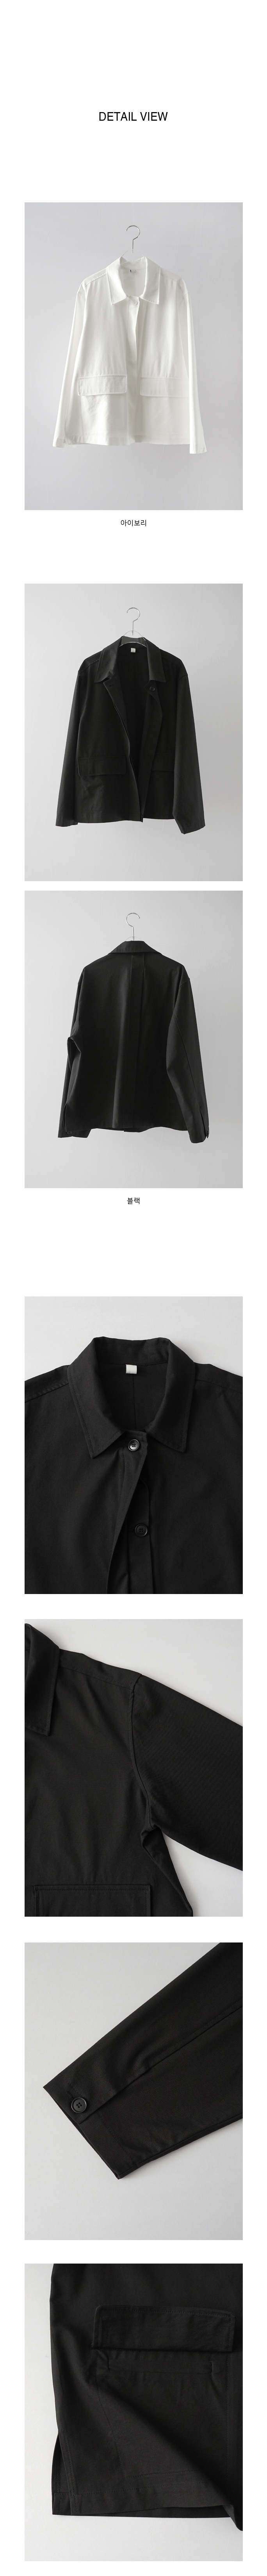 casual clean hidden button jacket